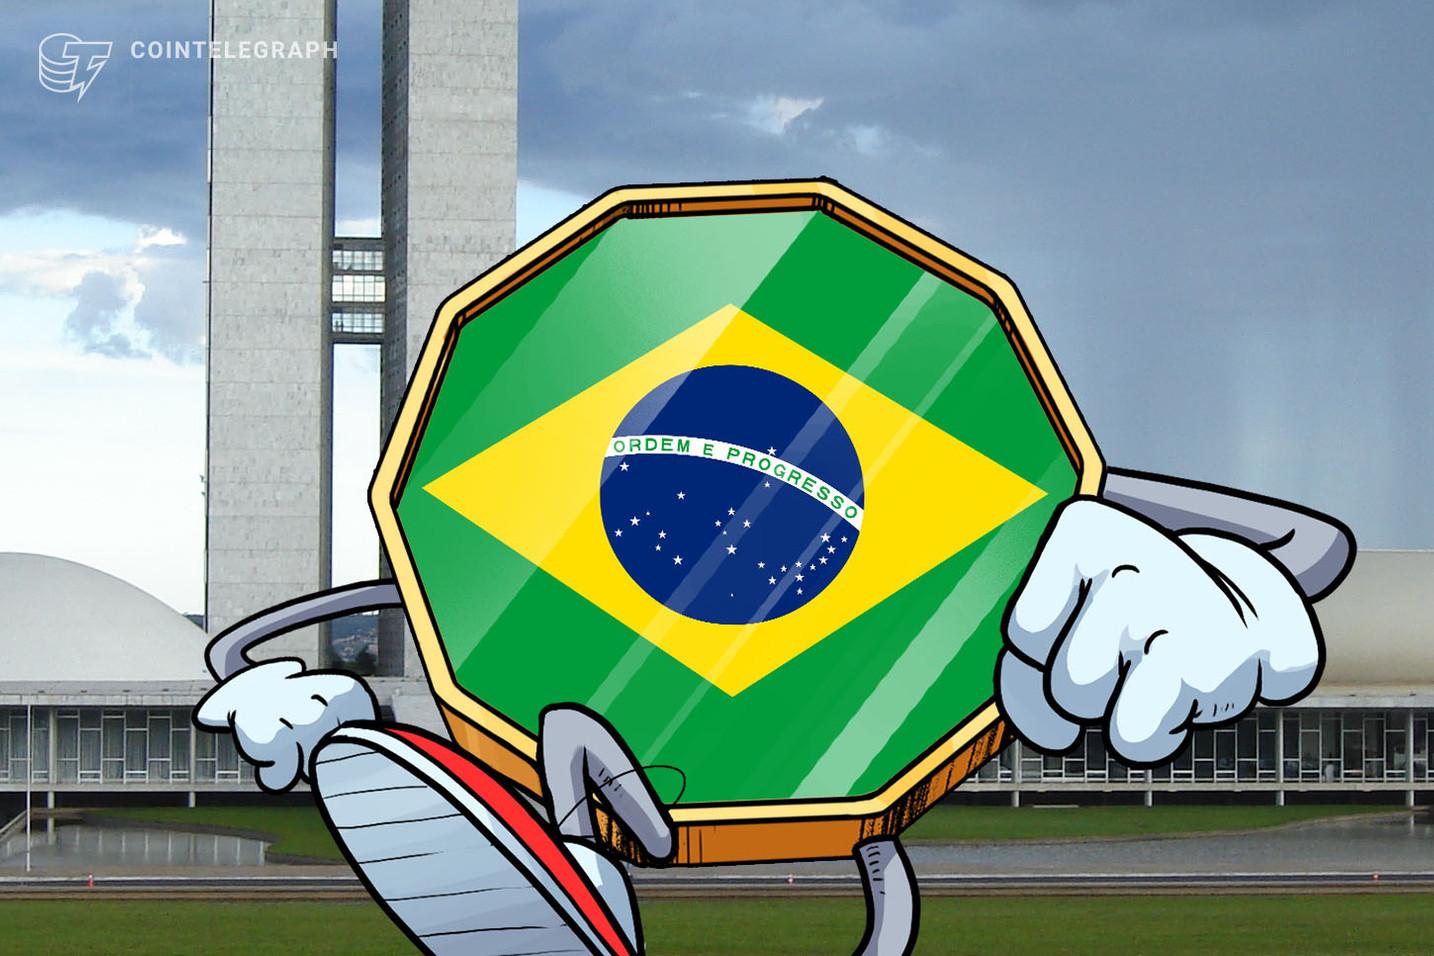 'Fantástico': deputado que vai regulamentar Bitcoin é acusado de estelionato e de aplicar golpes no Brasil e nos EUA